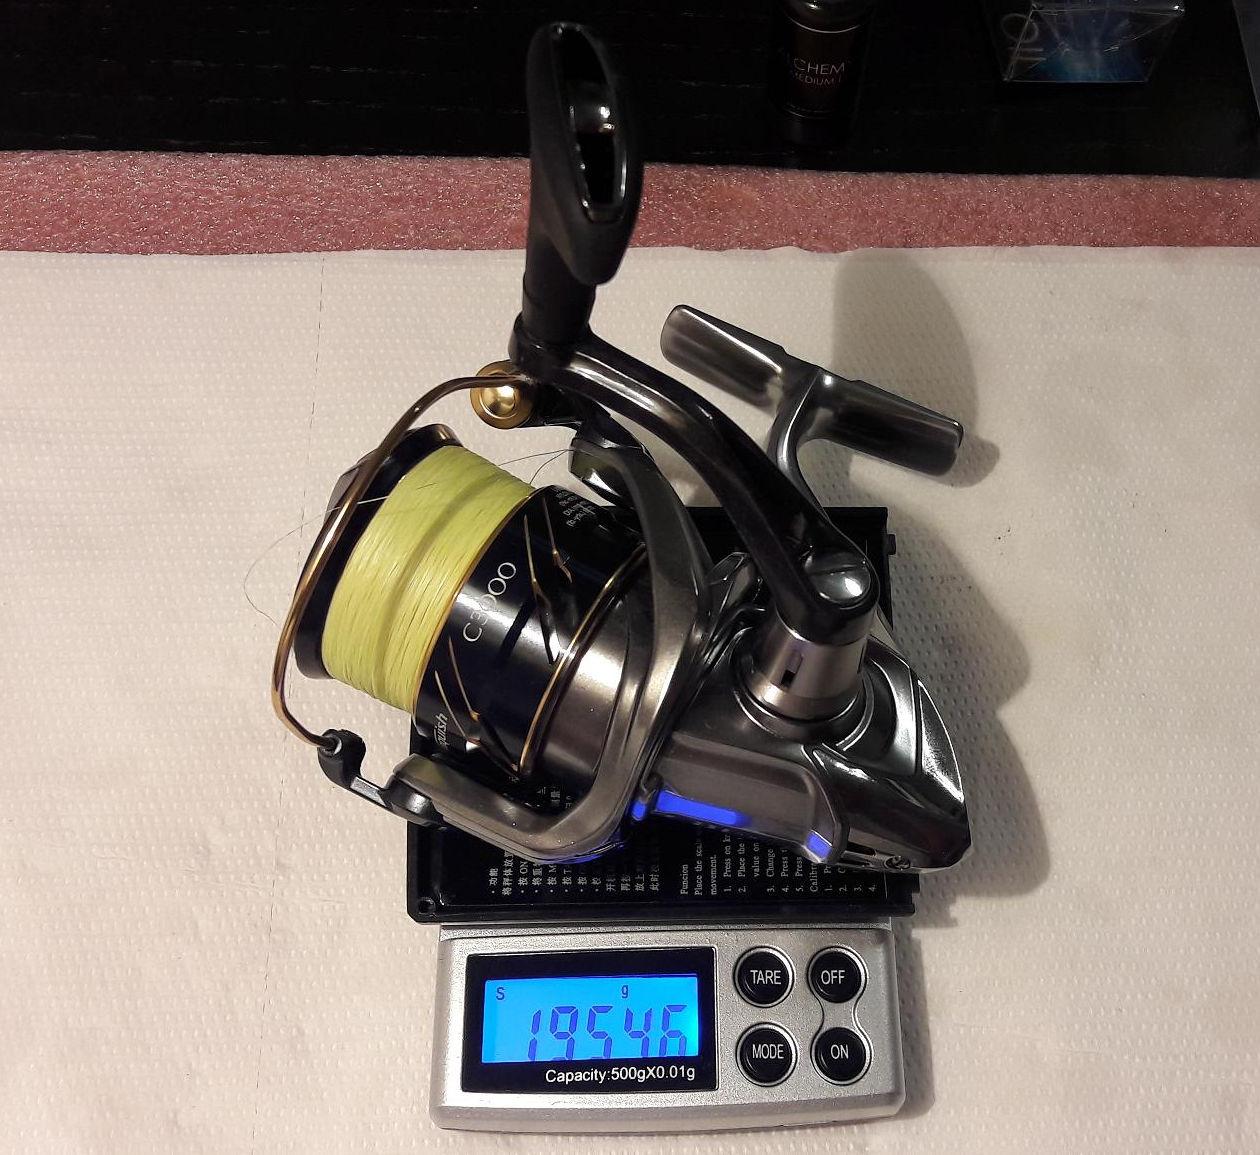 Shimano Vanquish FA fishing reel review - Get the reel